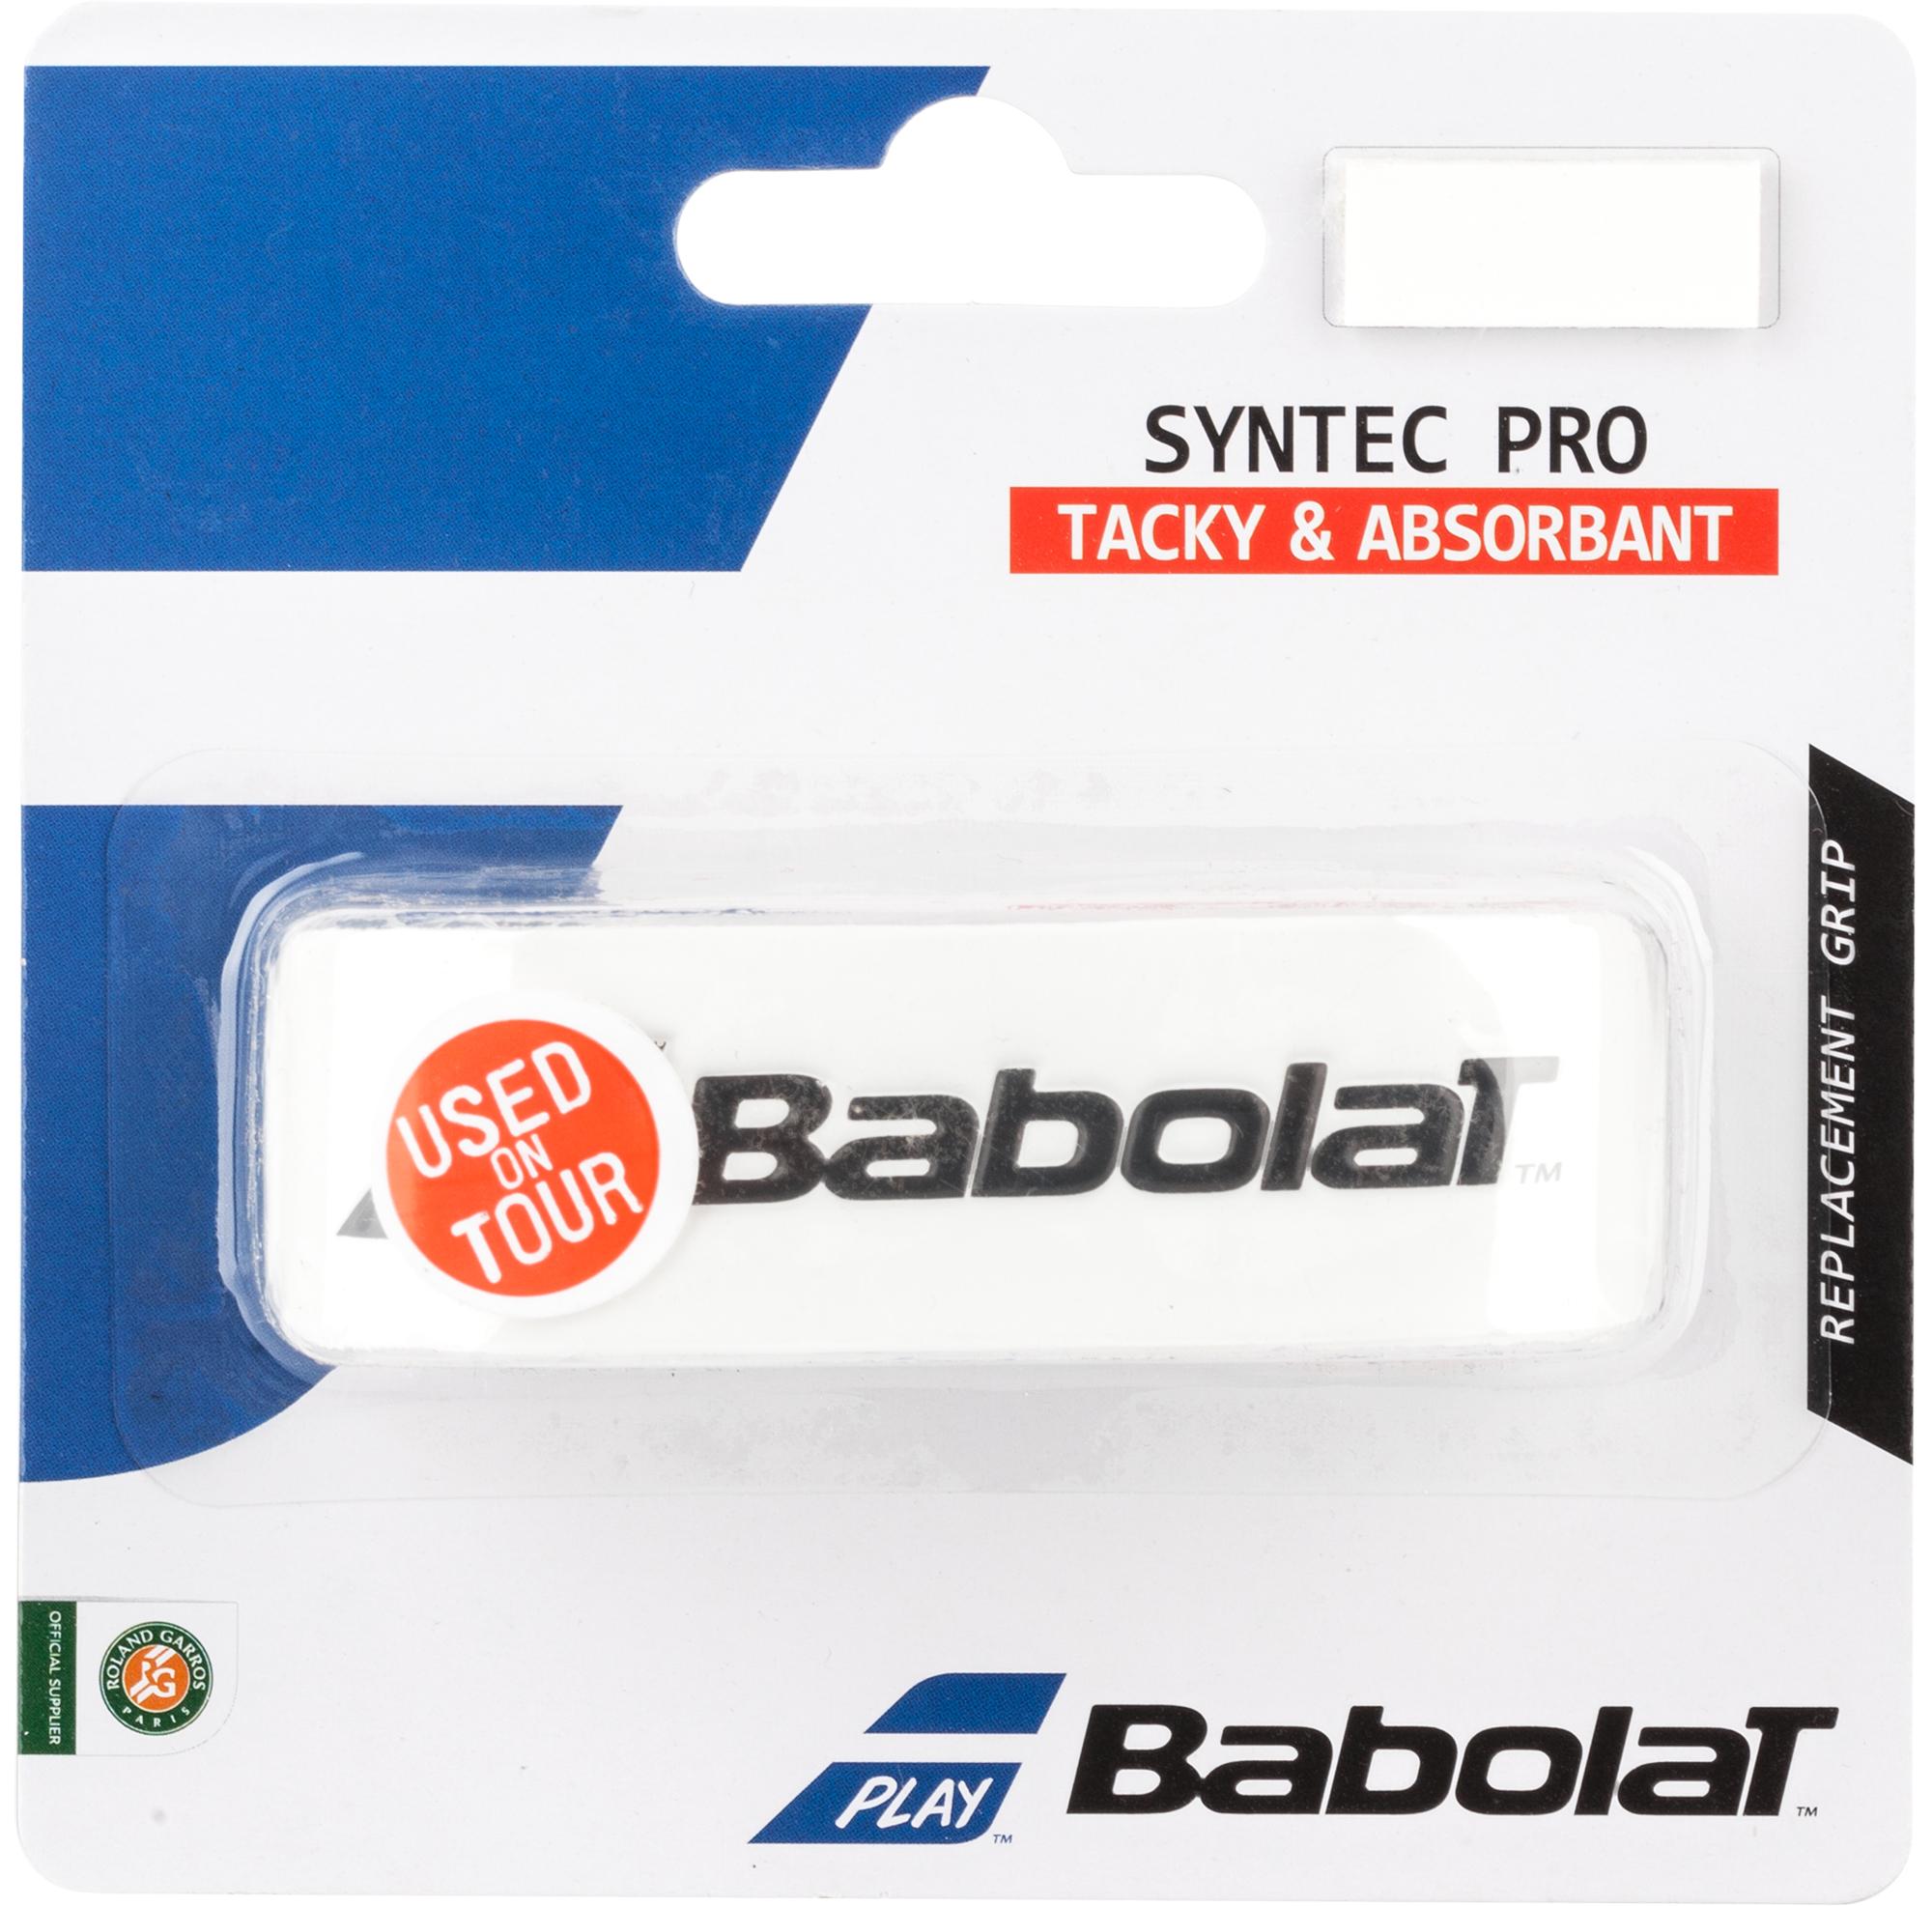 Babolat Намотка базовая Babolat Syntec Pro